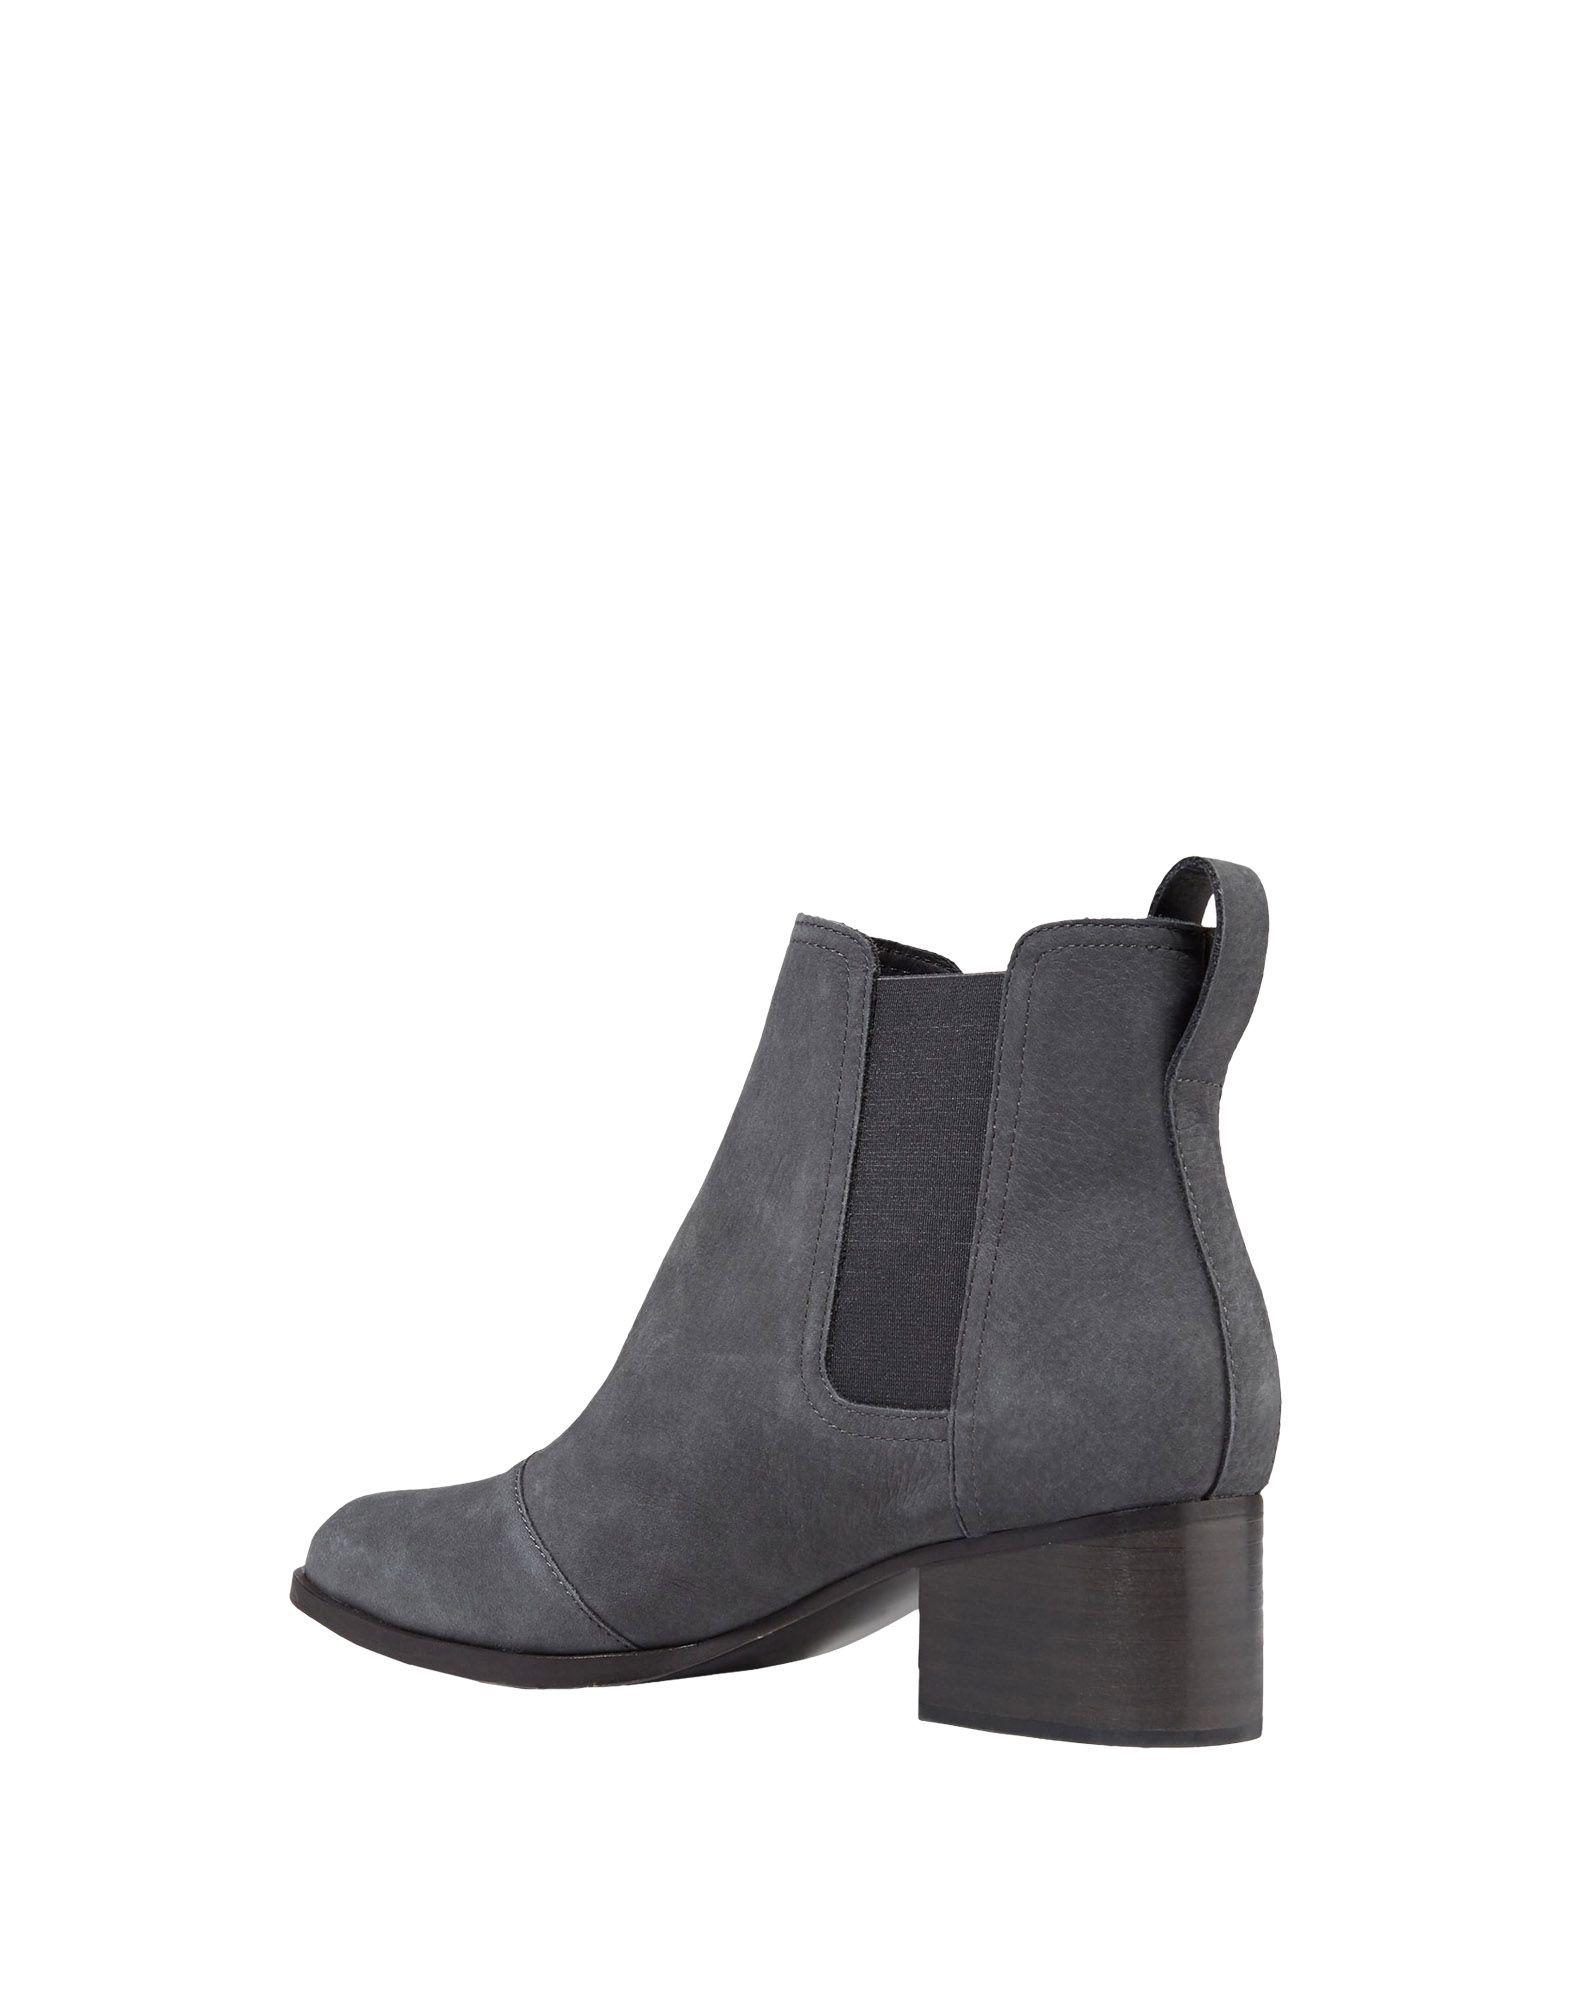 Rabatt Schuhe Rag & Bone Stiefelette Damen  11513758UL